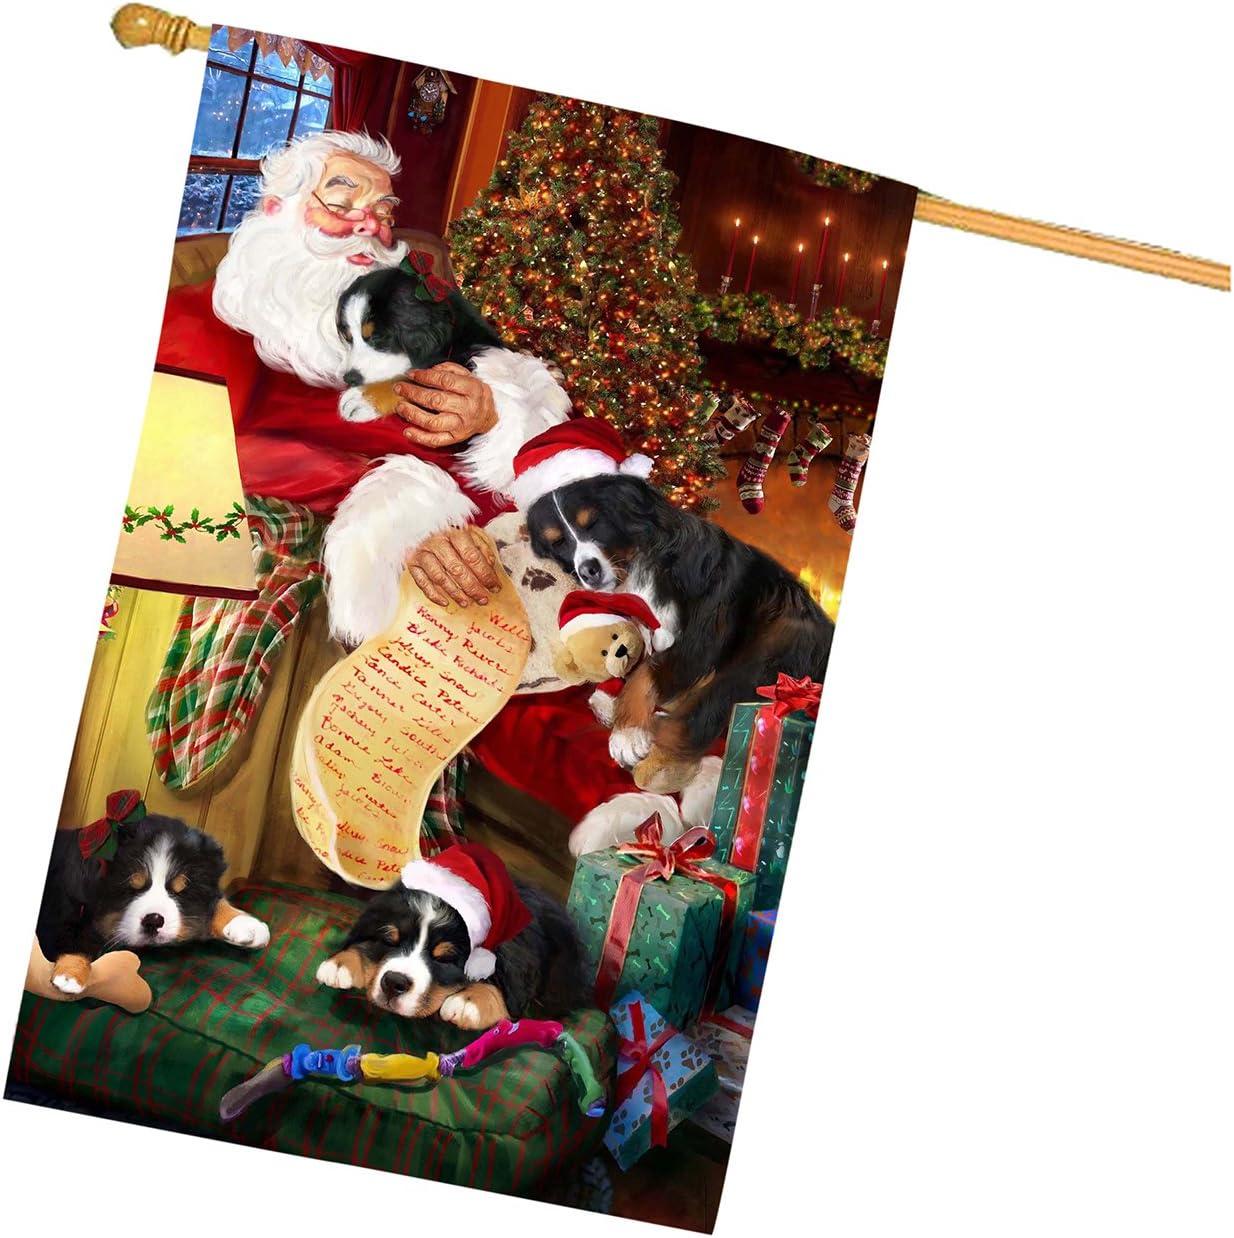 Bernedoodle Santa Sleeping with Dog /& Cats Semi-Automatic Foldable Umbrella Black Cat Birman Cat Bichon Frise Bernese Mountain